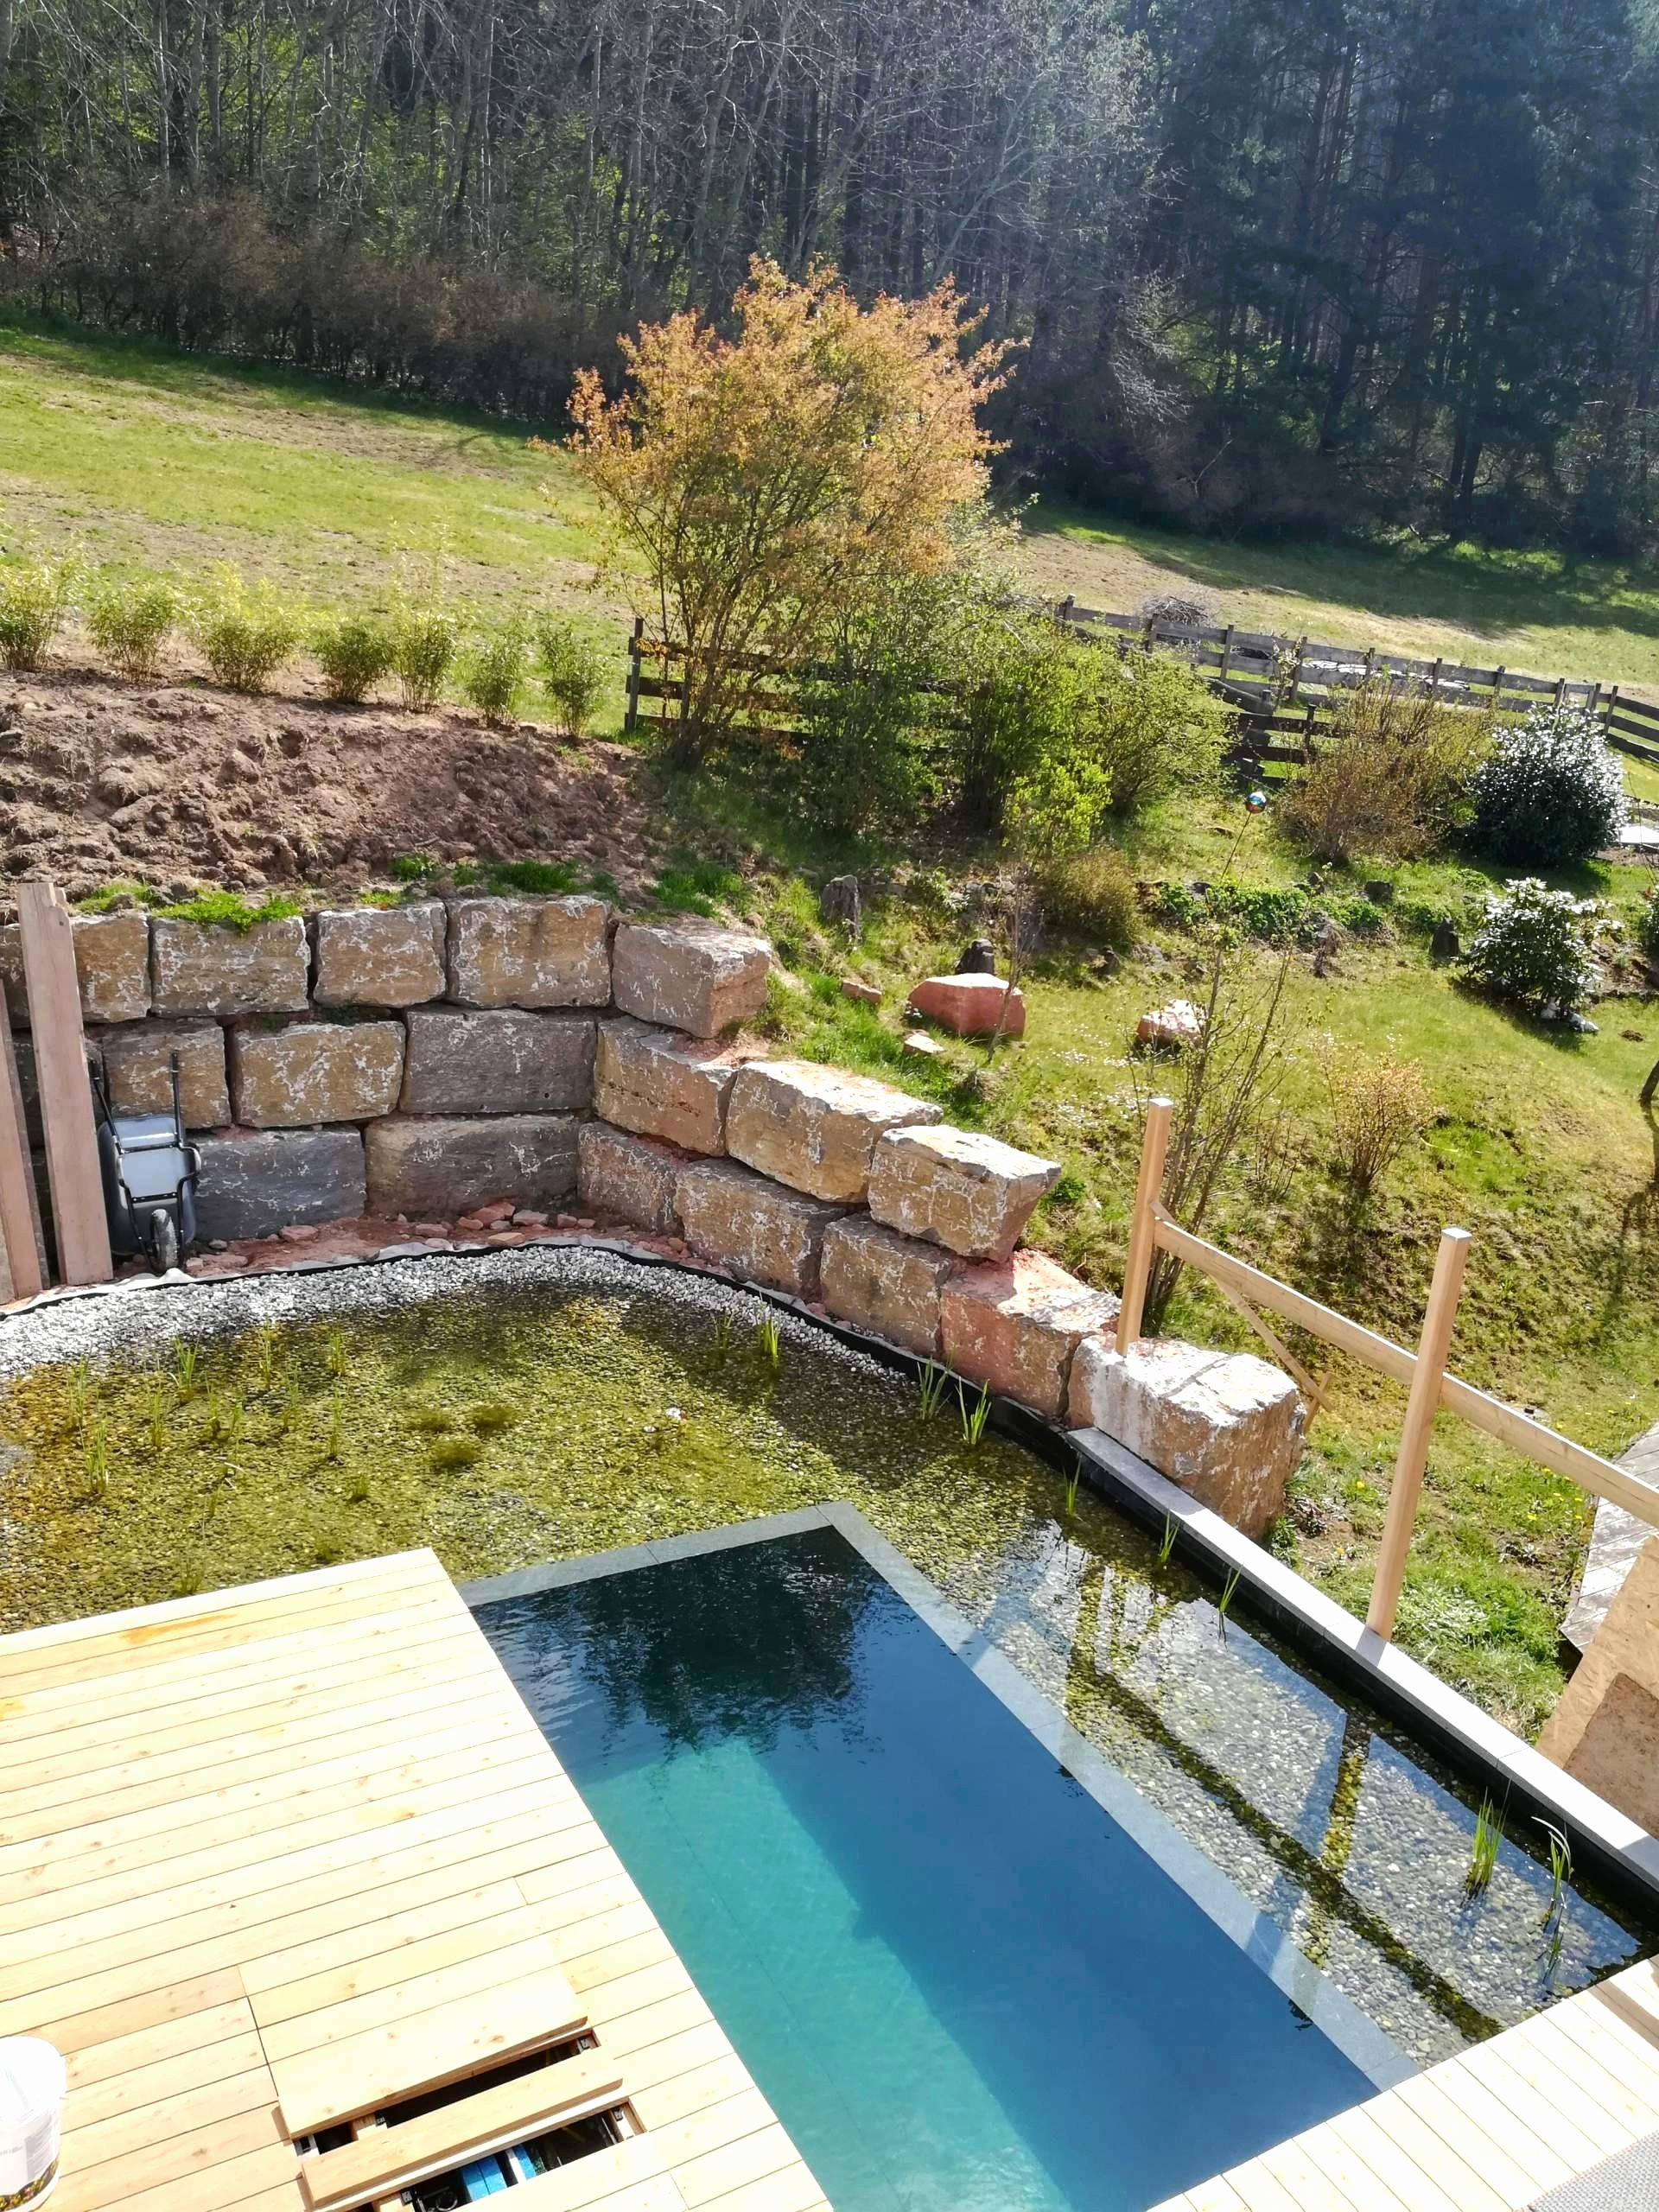 terrasse jardin pas cher elegant piscine bois pas cher genial barriere en bois de jardin de joli od of terrasse jardin pas cher